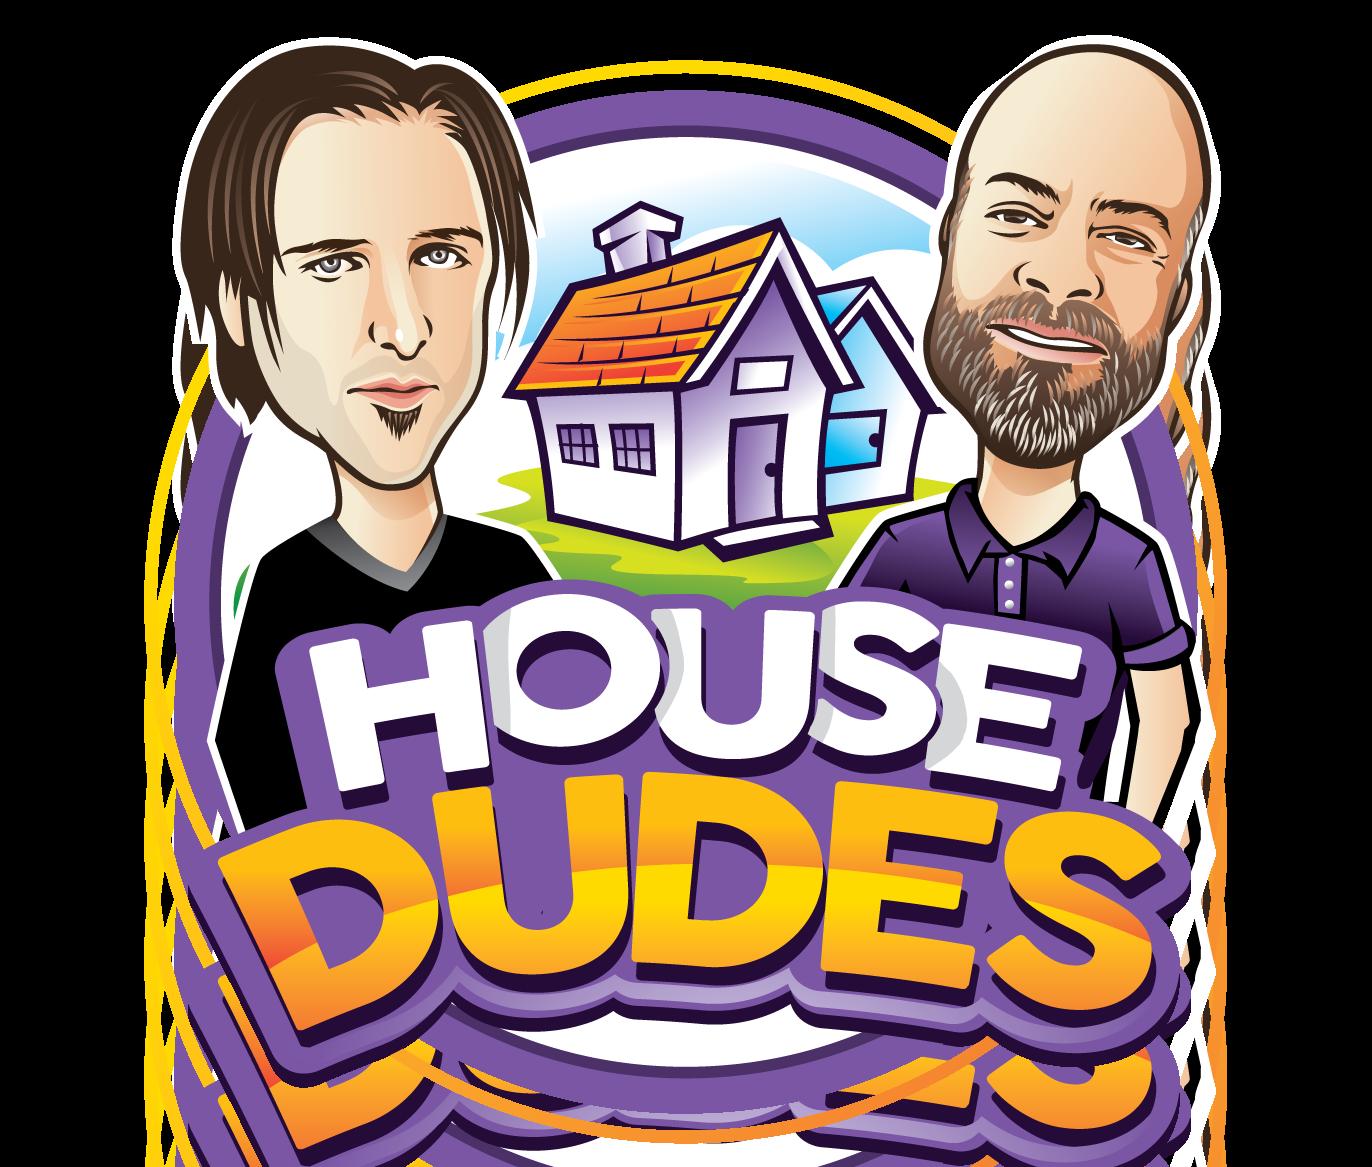 House Dudes logo